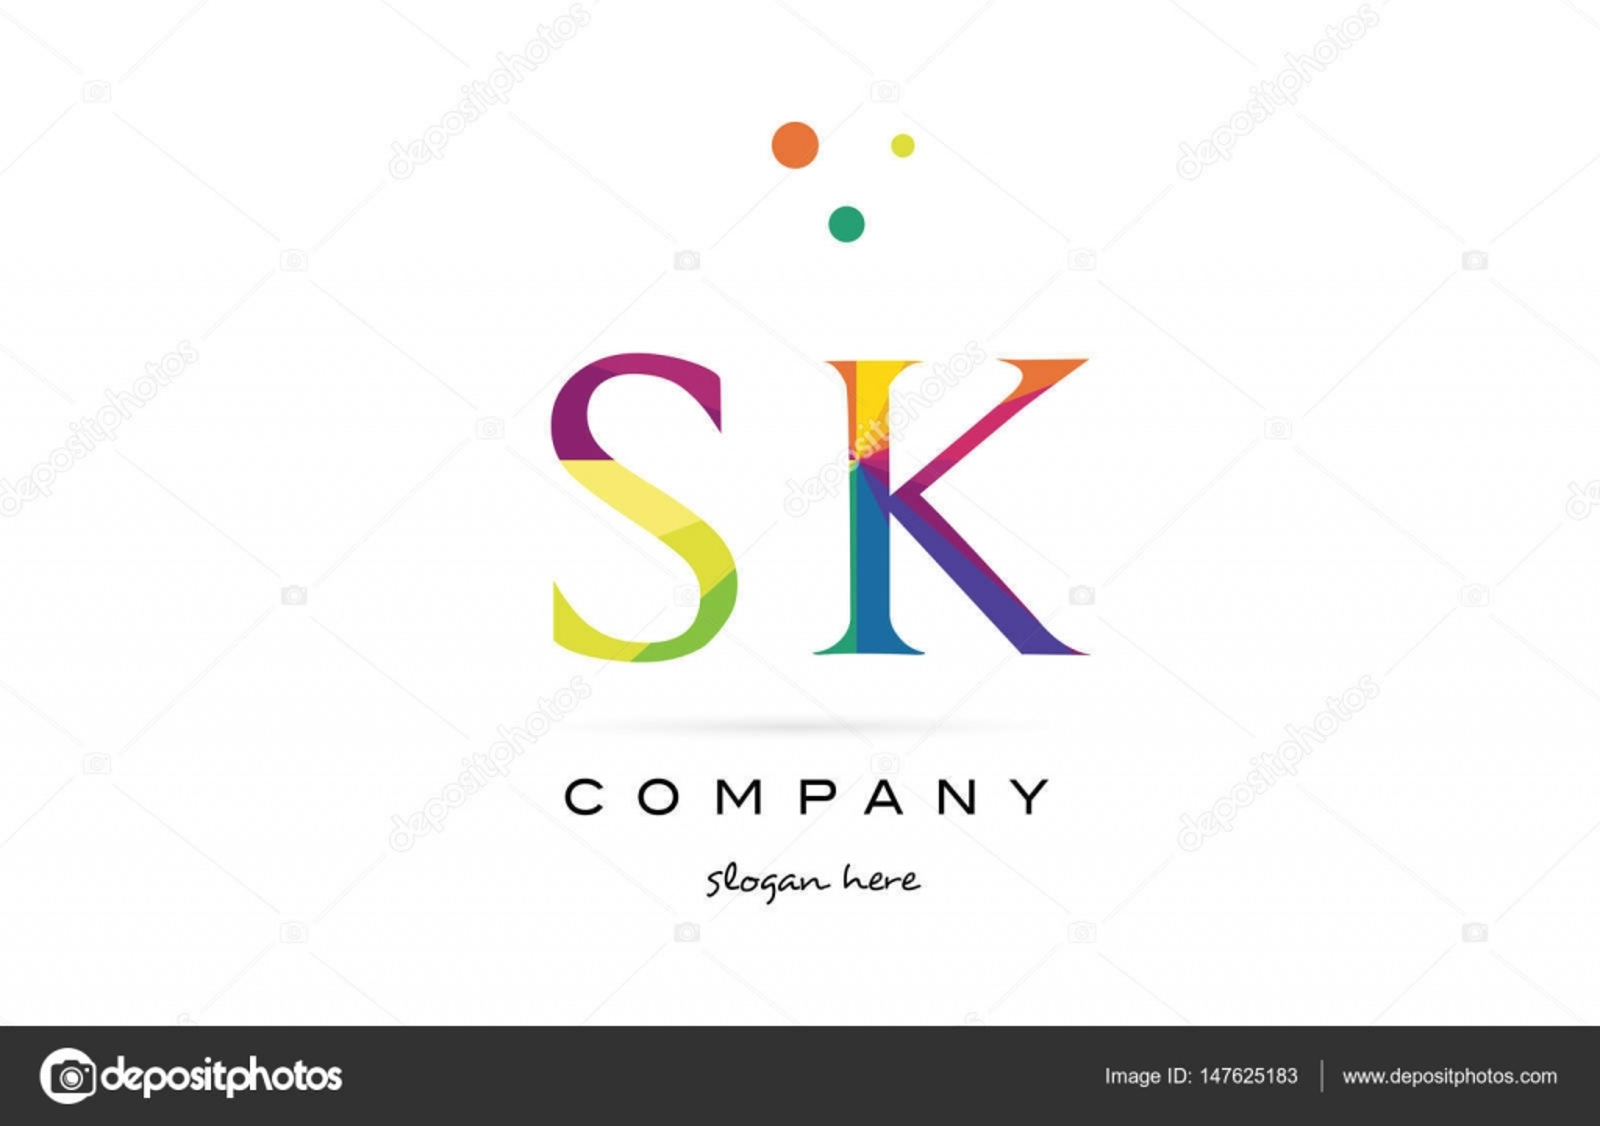 SK s k kreative Regenbogen Farben Alphabet Buchstaben Logo Symbol ...